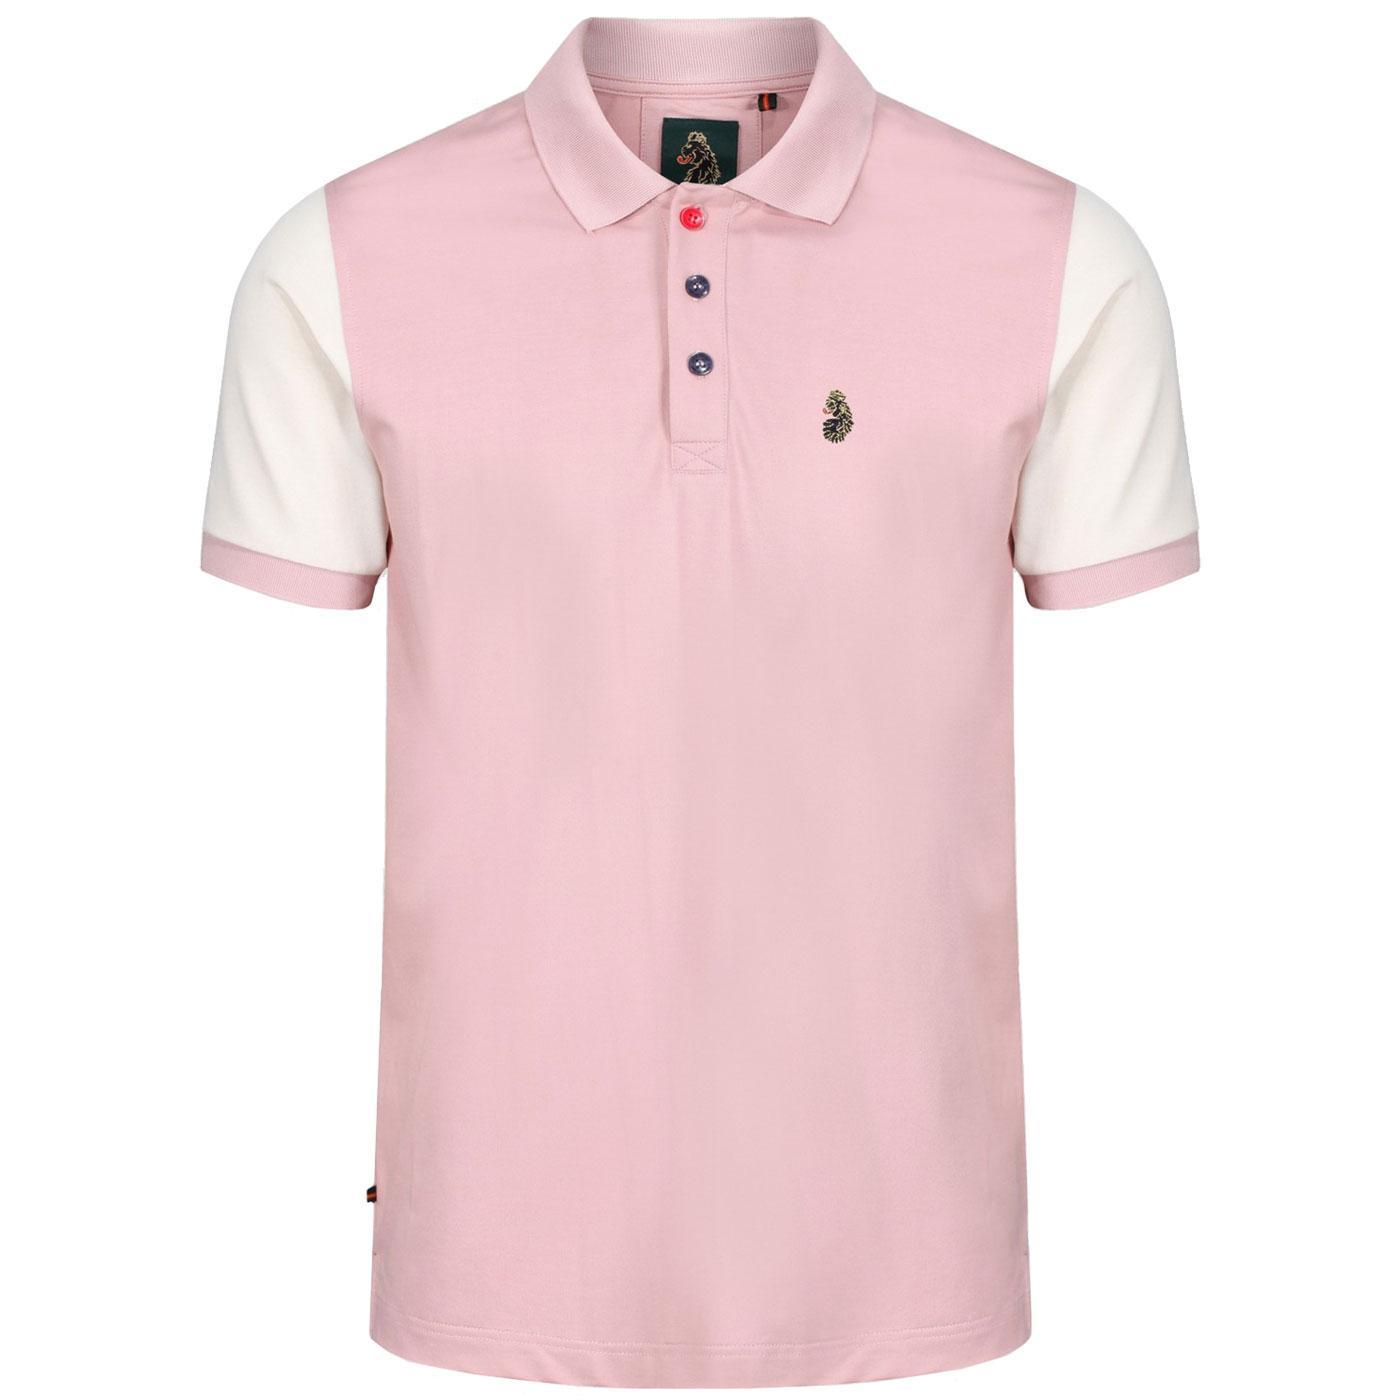 Selecter LUKE Mens Retro Mod Pique Polo Shirt (PP)